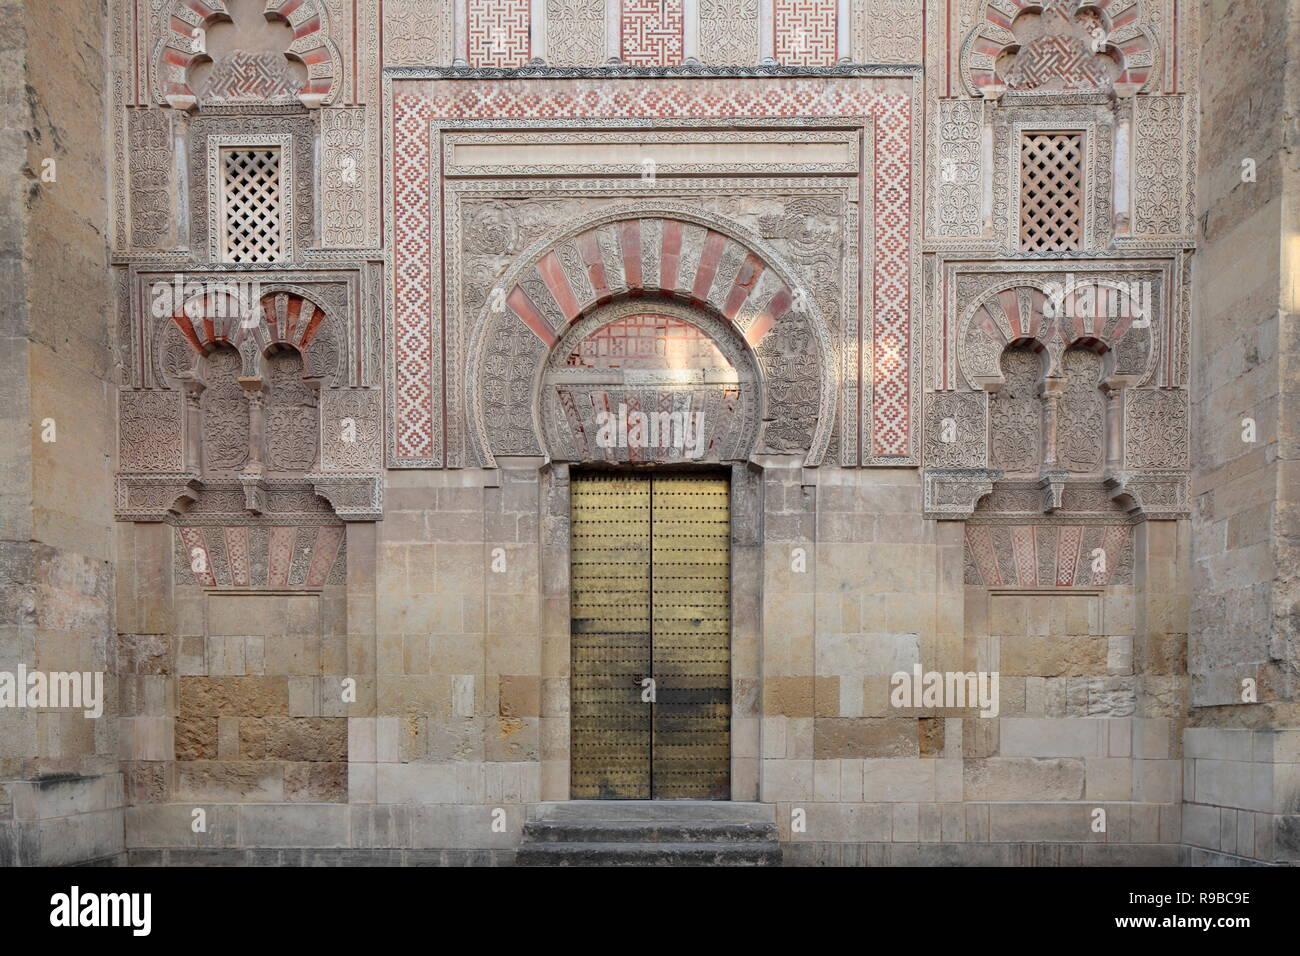 Doorway, The Mezquita, Cordoba, Spain Stock Photo